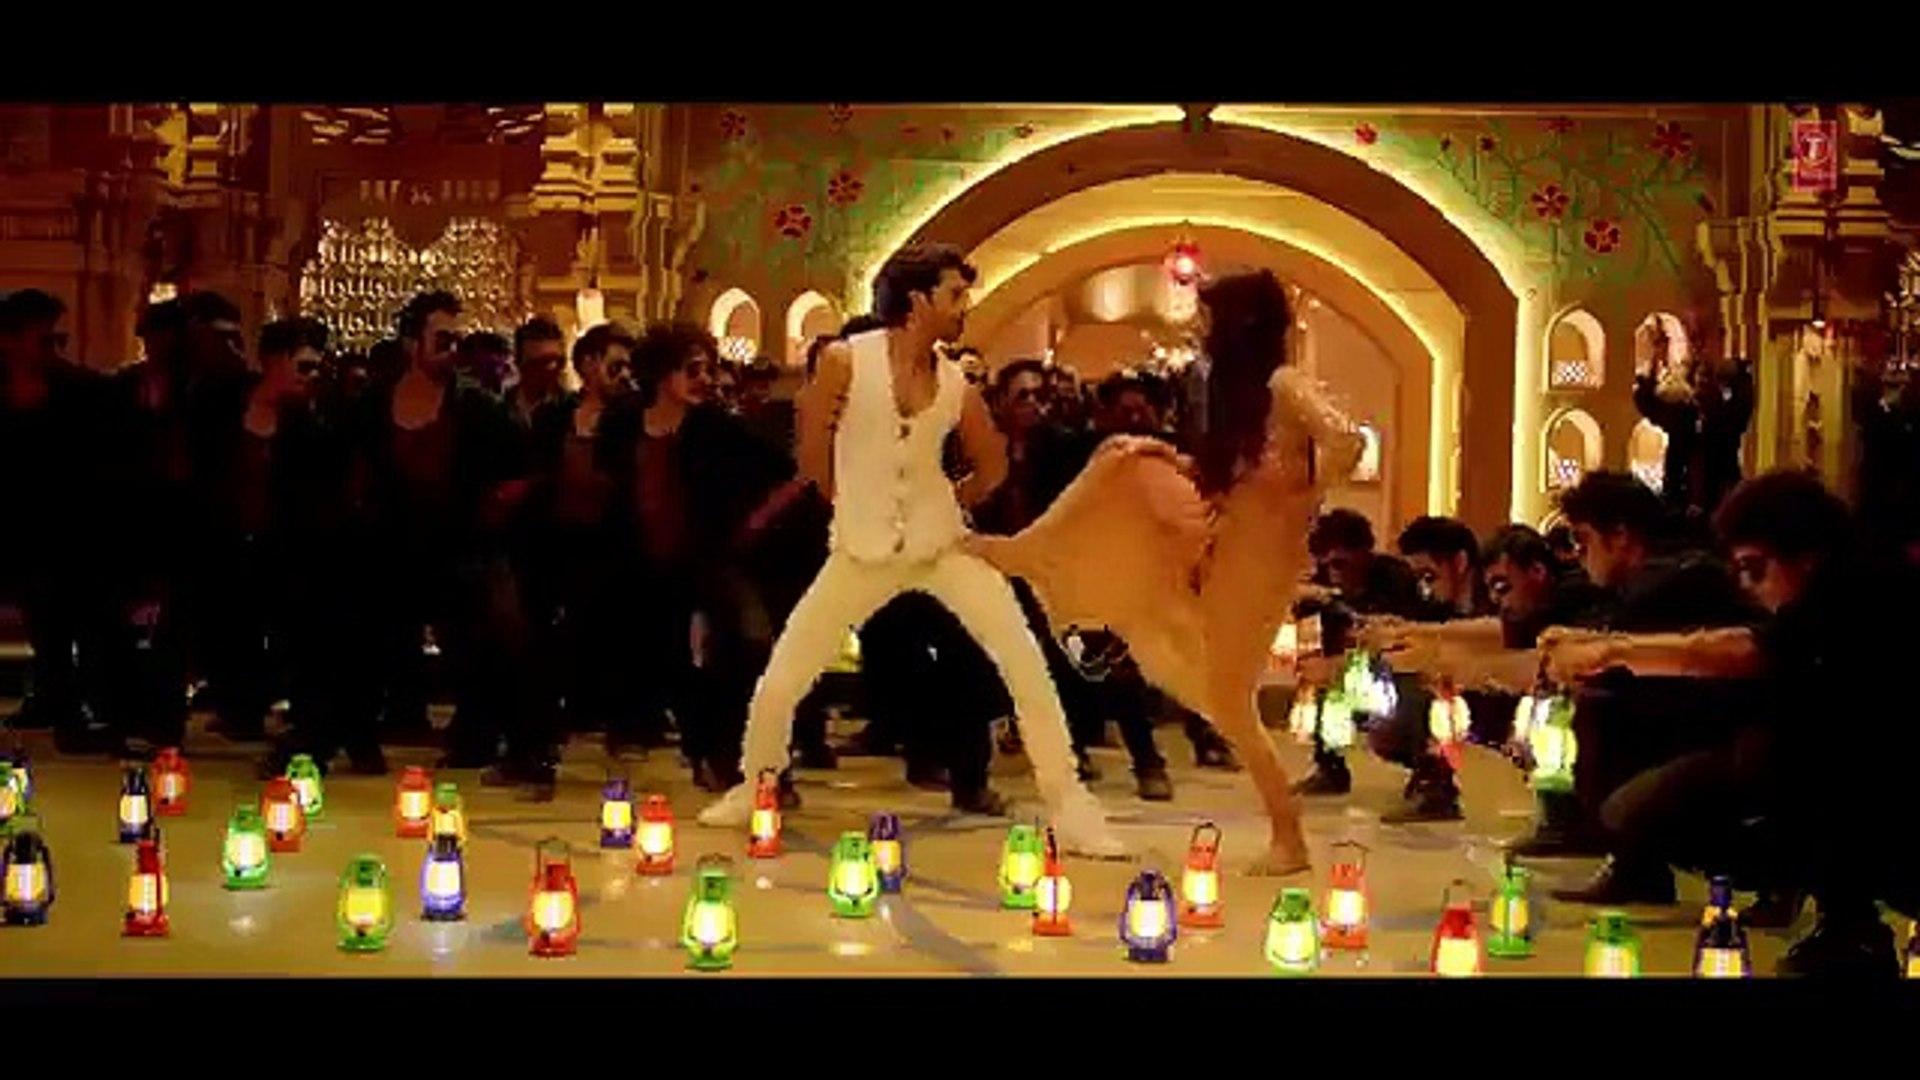 Naach Meri Bulbul Hey Bro 2015 New Indian Movies Songs By Himesh Reshammiya and Shreya Ghoshal ~ Son